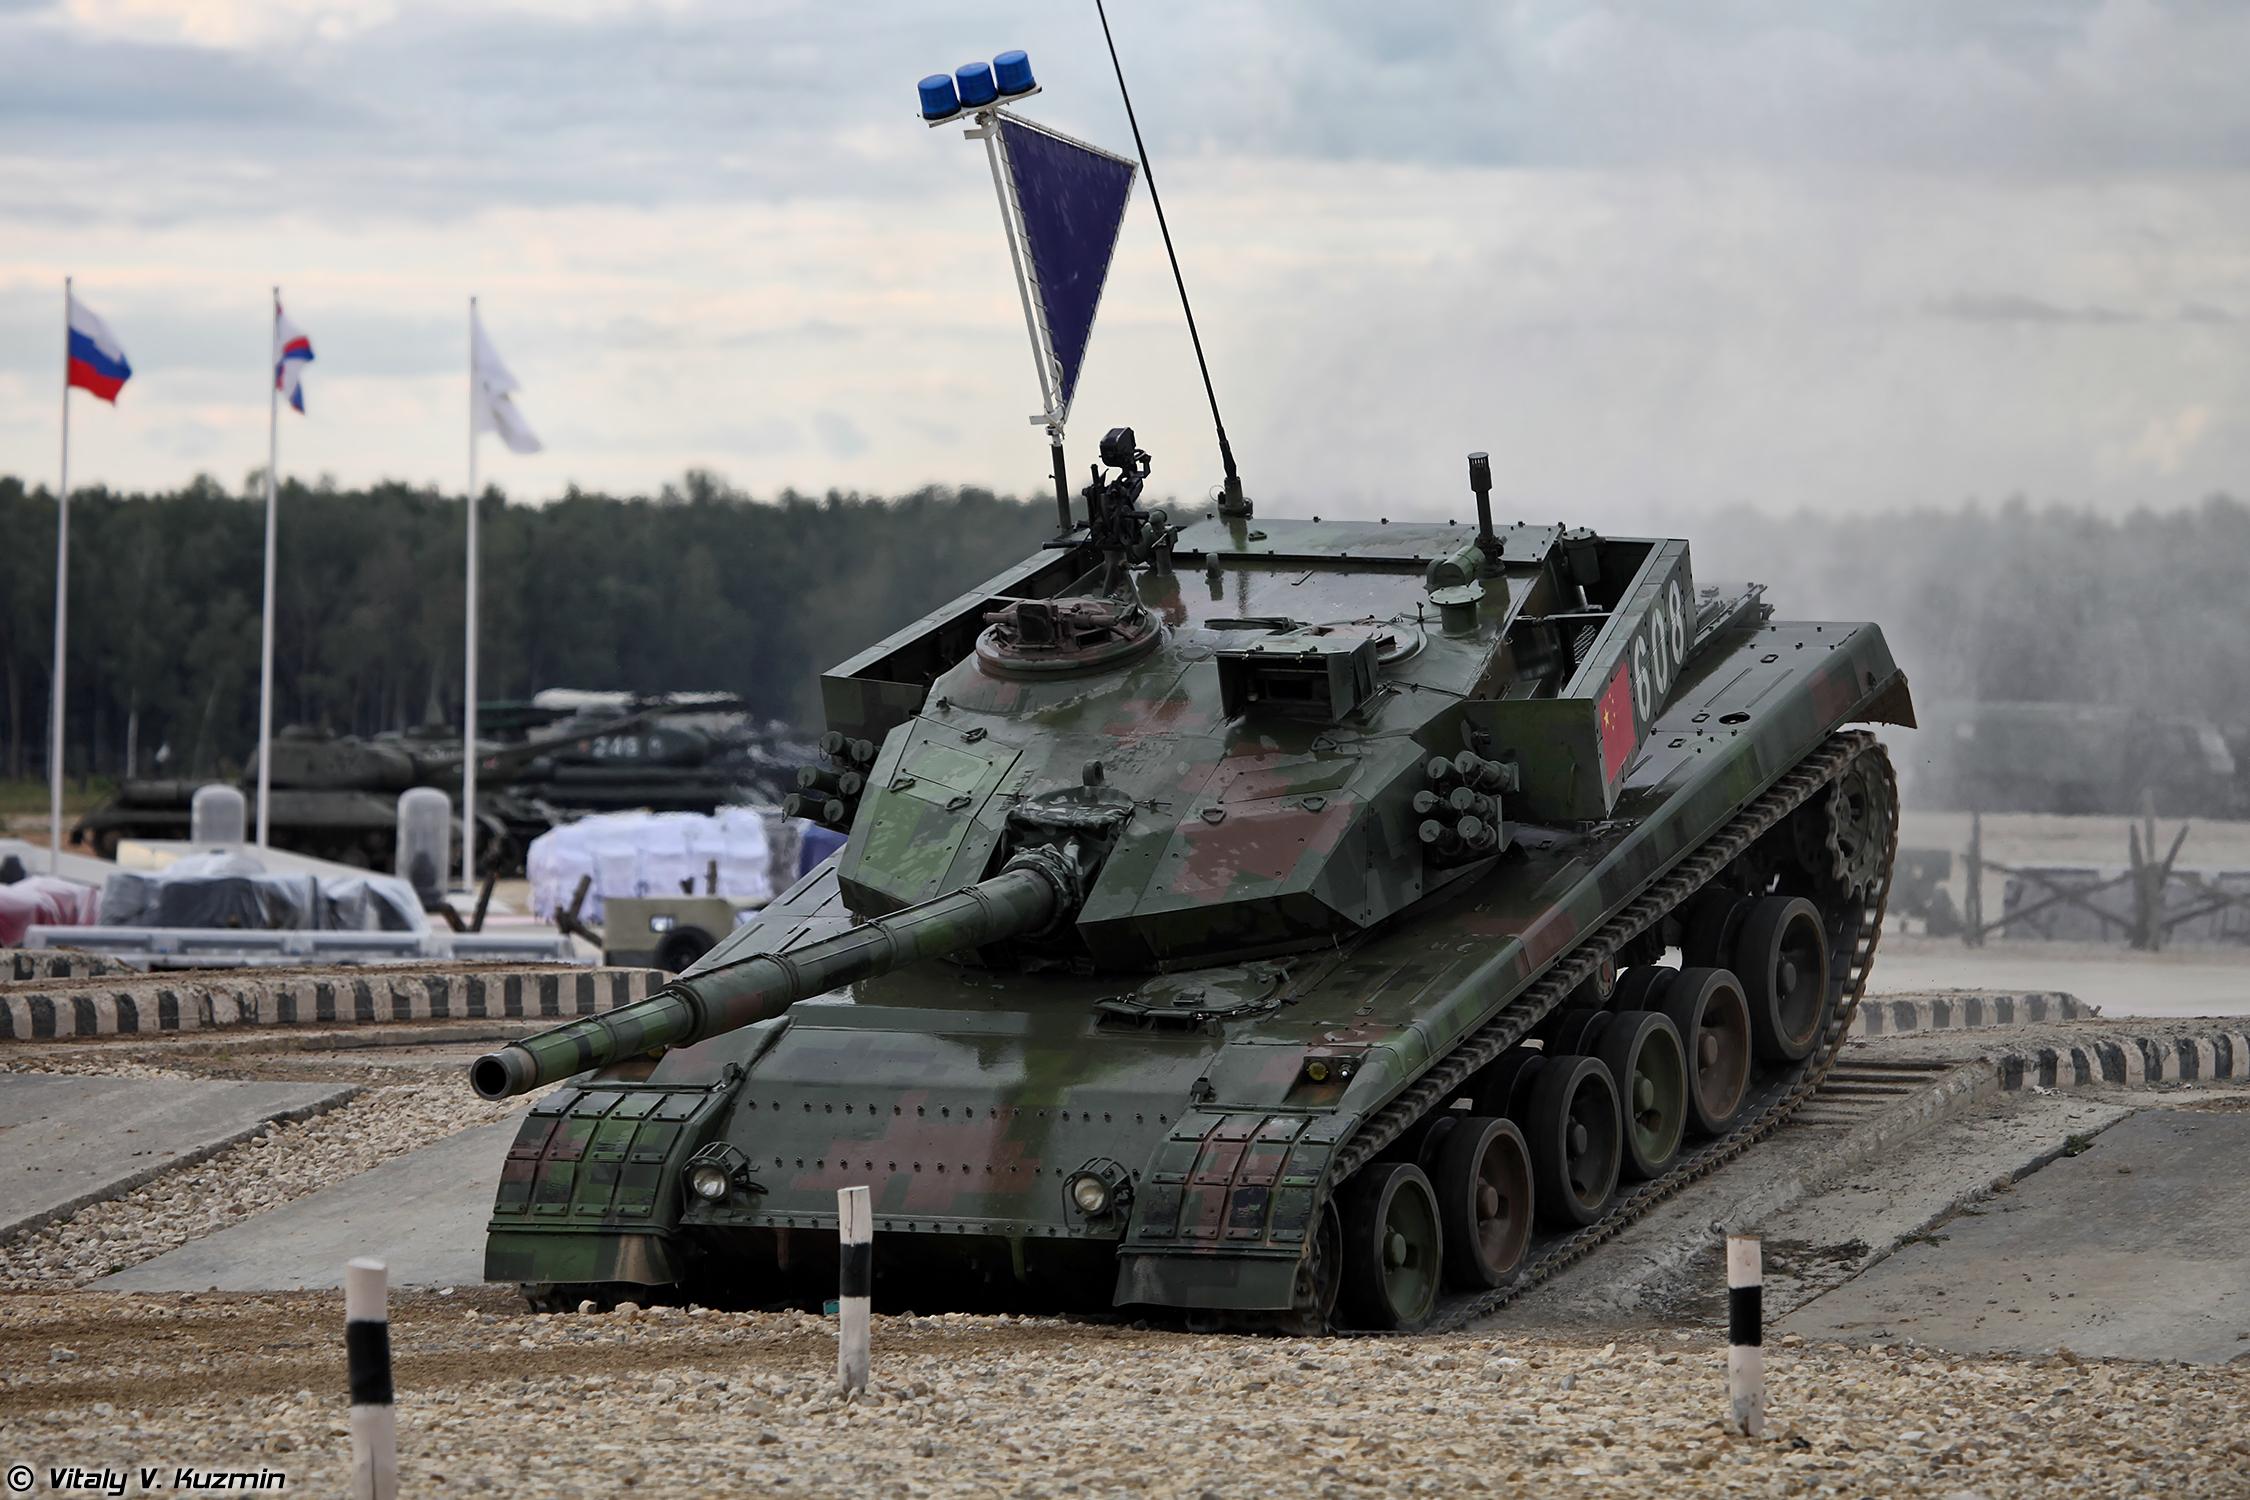 https://77rus.smugmug.com/Military/Final-Tank-Biathlon-2015/i-89zr2TH/0/O/Tankbiathlon15finalp1-10.jpg